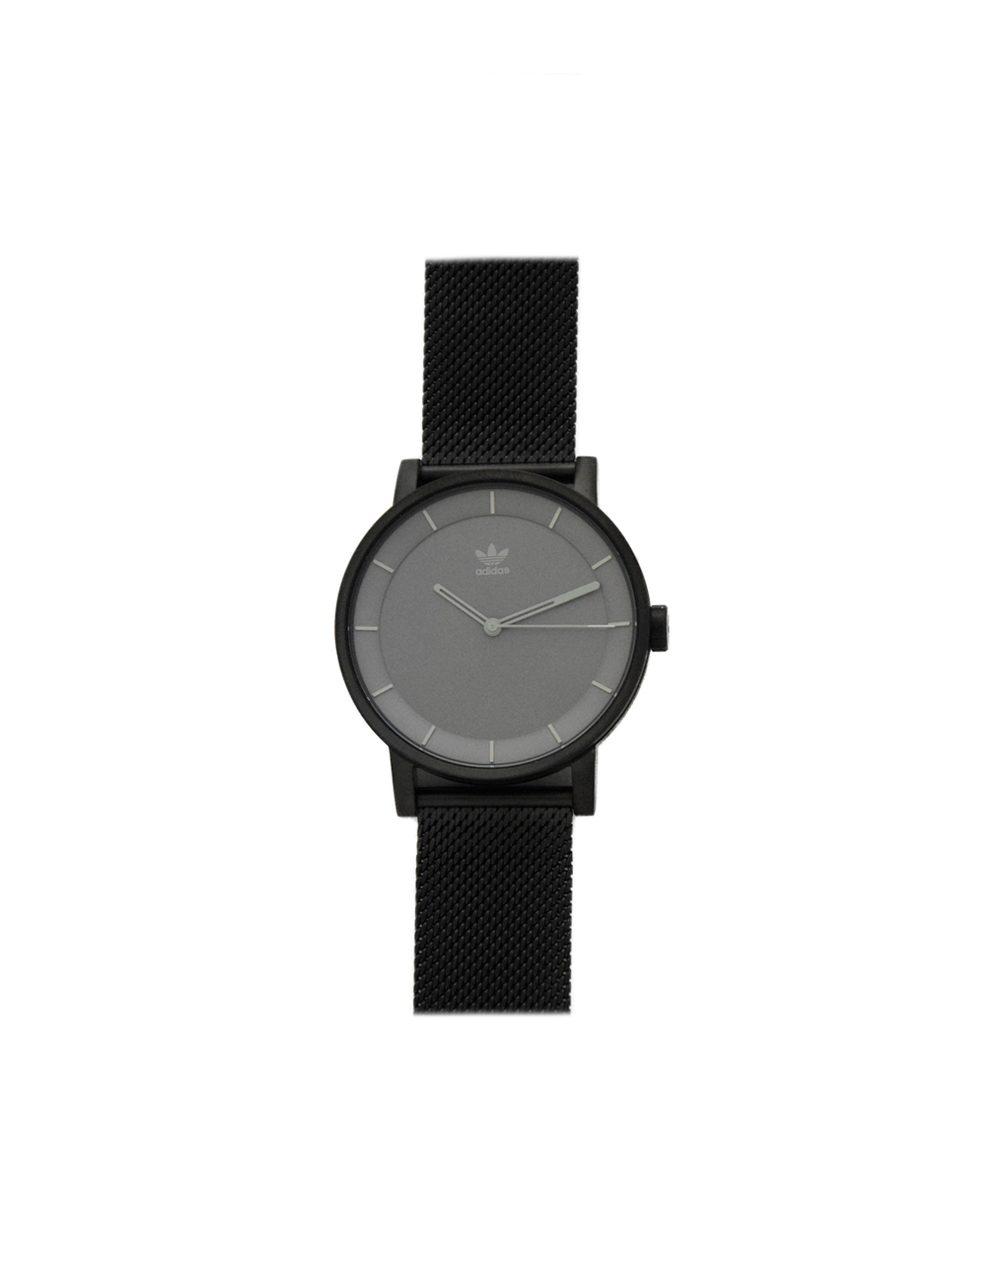 Adidas District_M1 Gunmetal/Grey (Z04-2068-00)